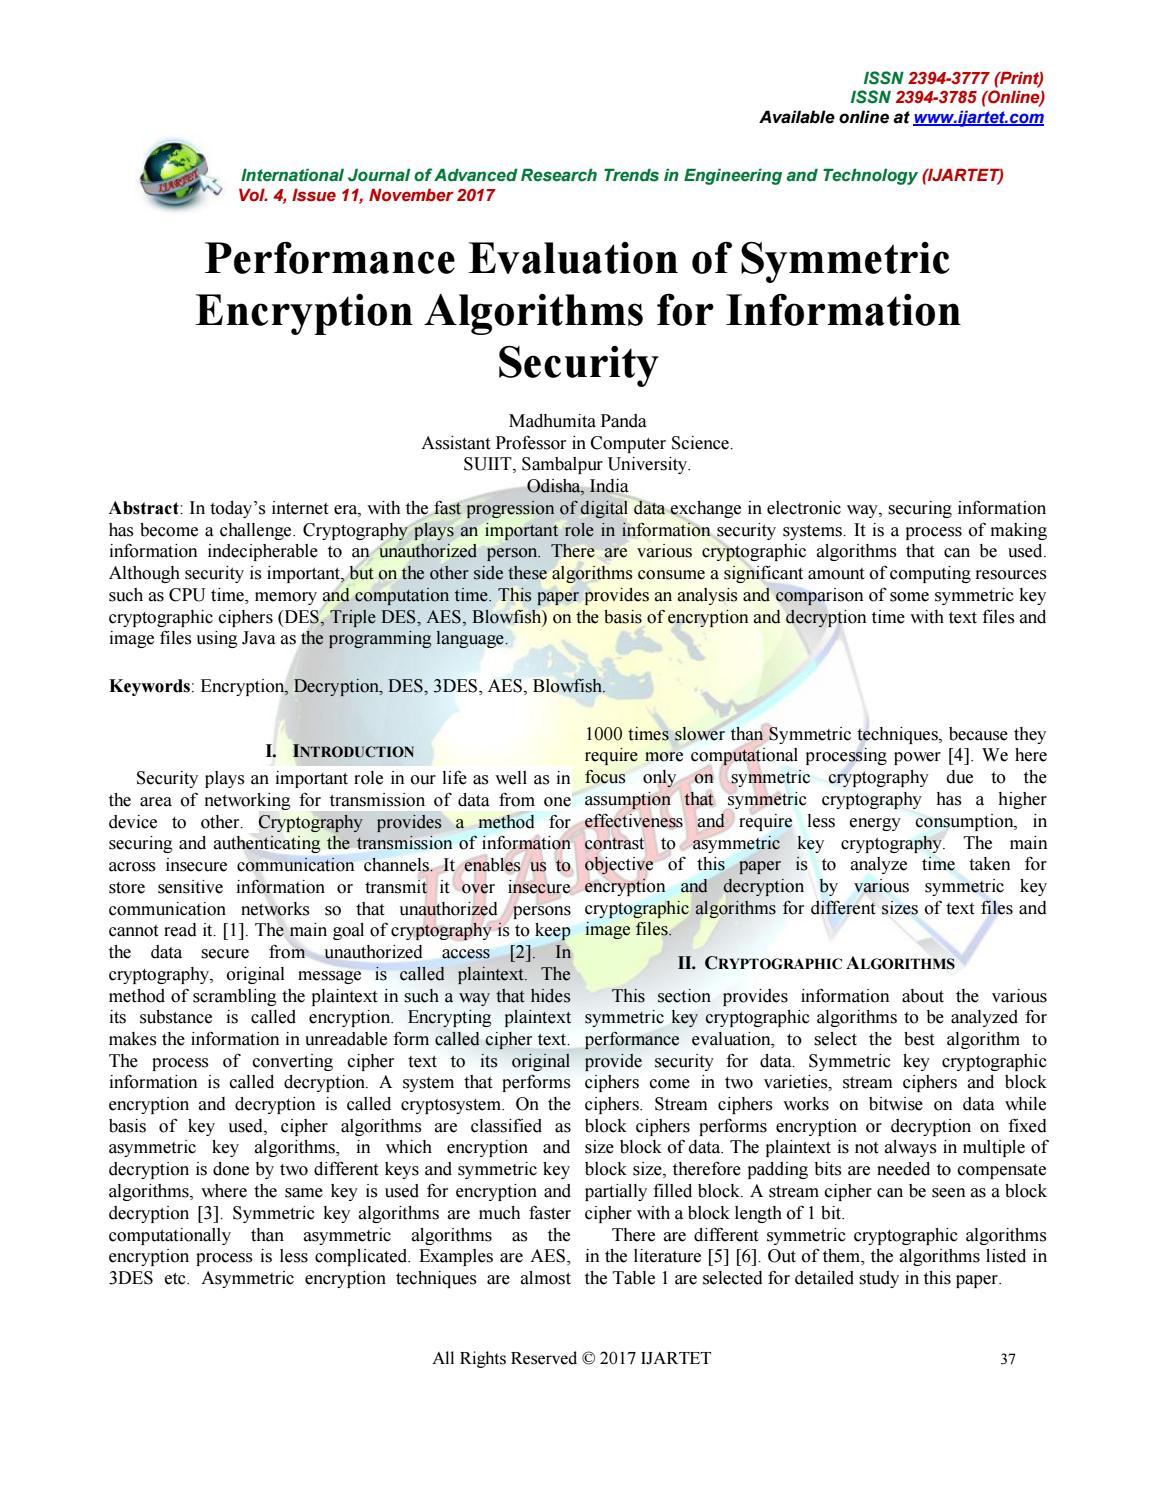 Performance evaluation of symmetric by IJARTET - issuu